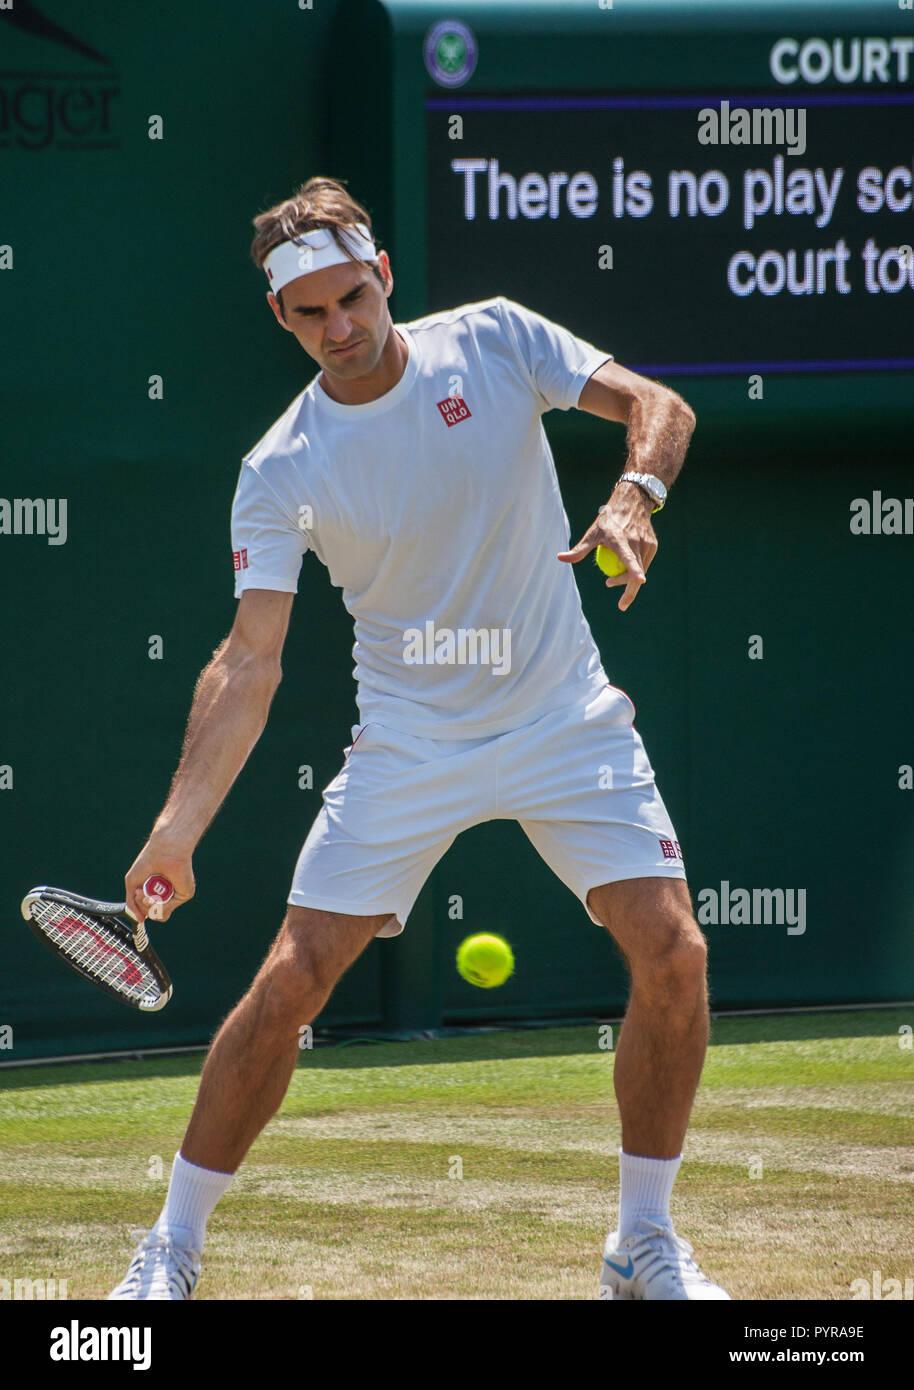 5d8ea856320 Roger Federer practica en tribunales fuera del campeonato de tenis de  Wimbledon 2018 Imagen De Stock